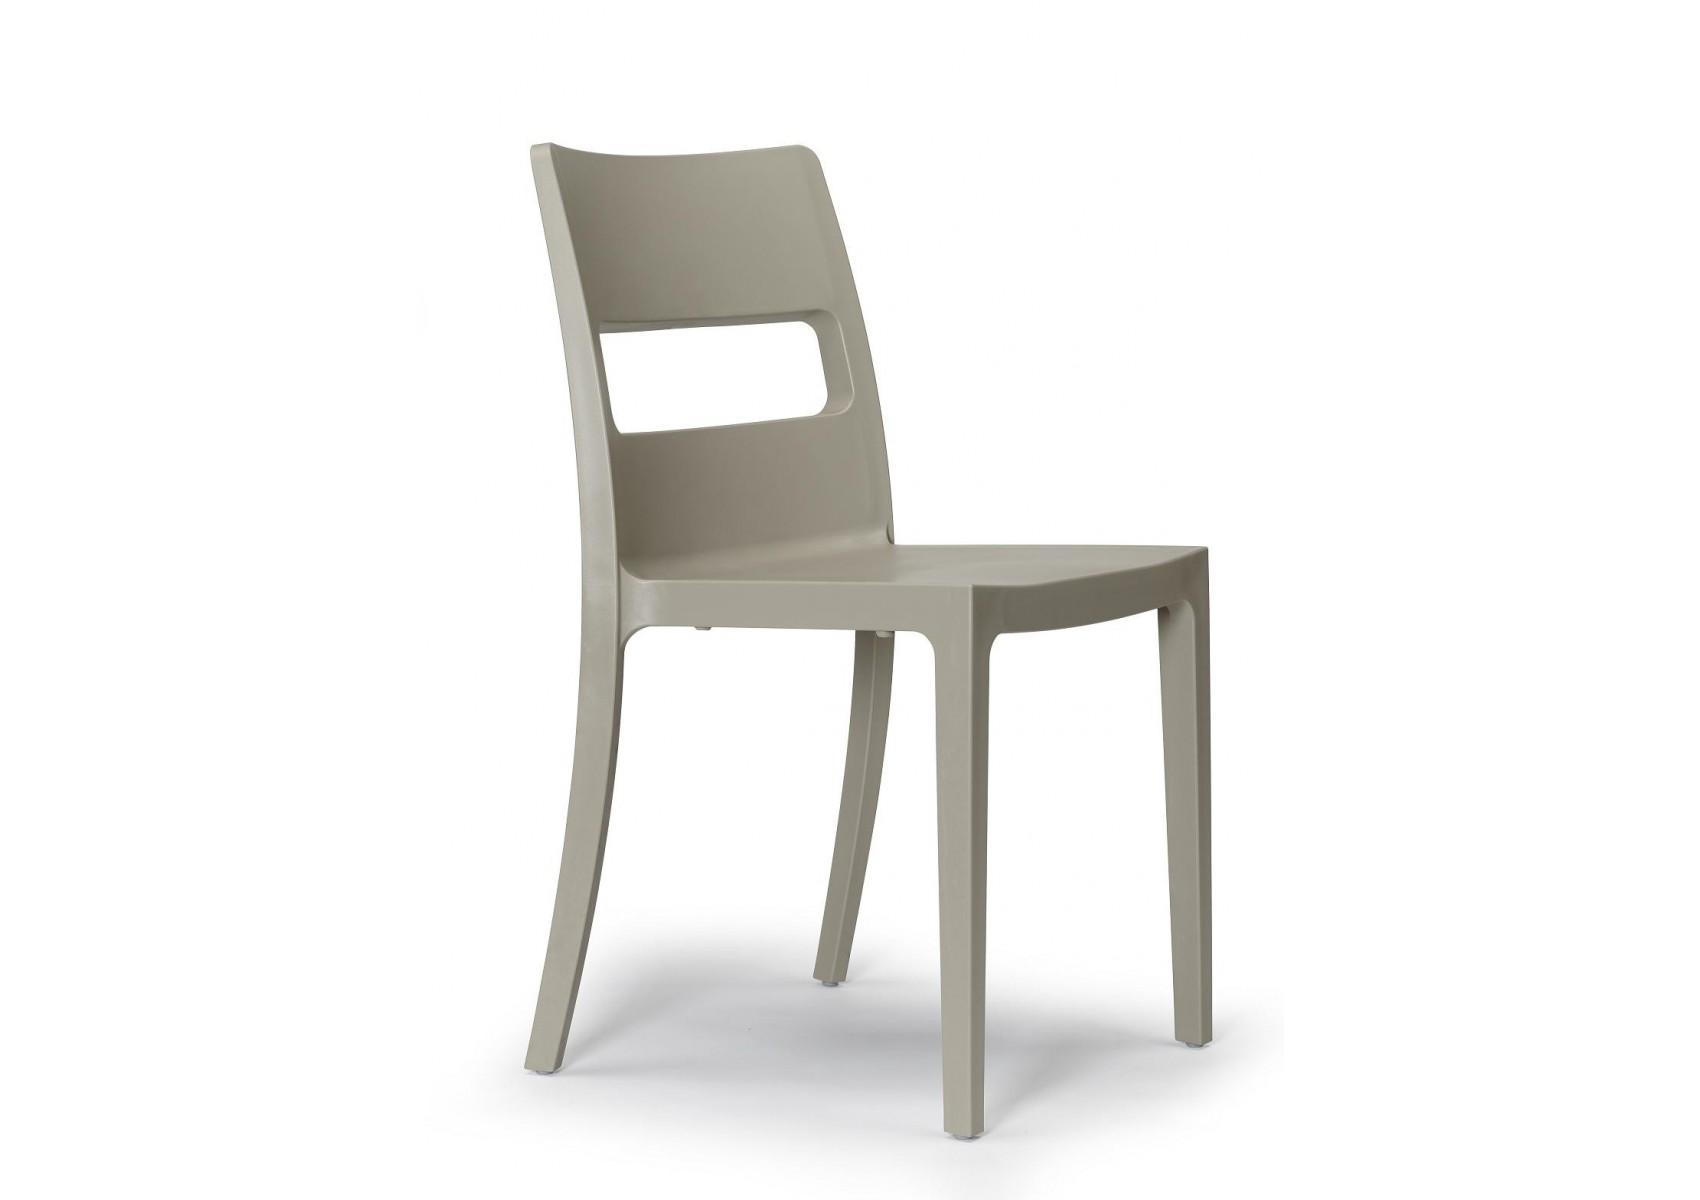 Chaise design de jardin sai scab design for Chaise de design